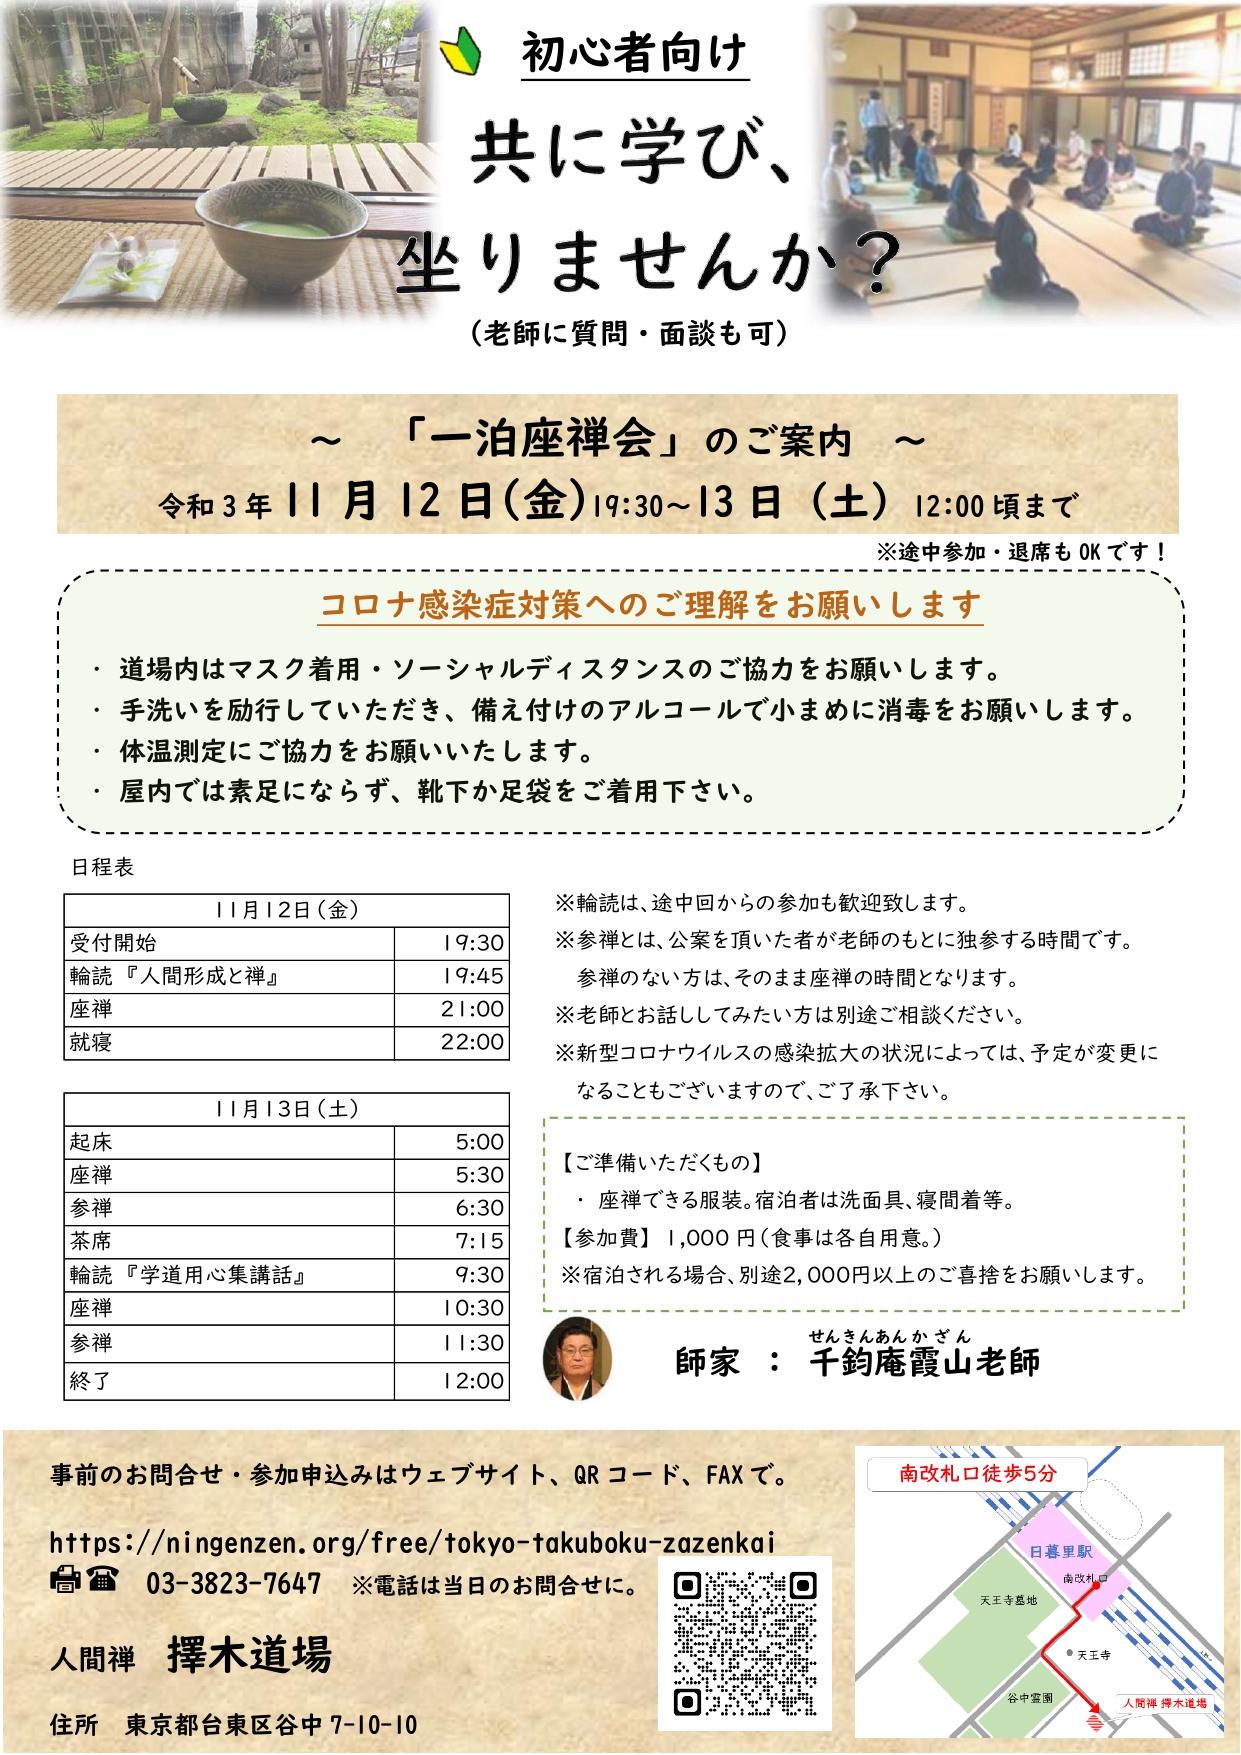 【最終版】一泊座禅会チラシ20211112・13_page-0001.jpg